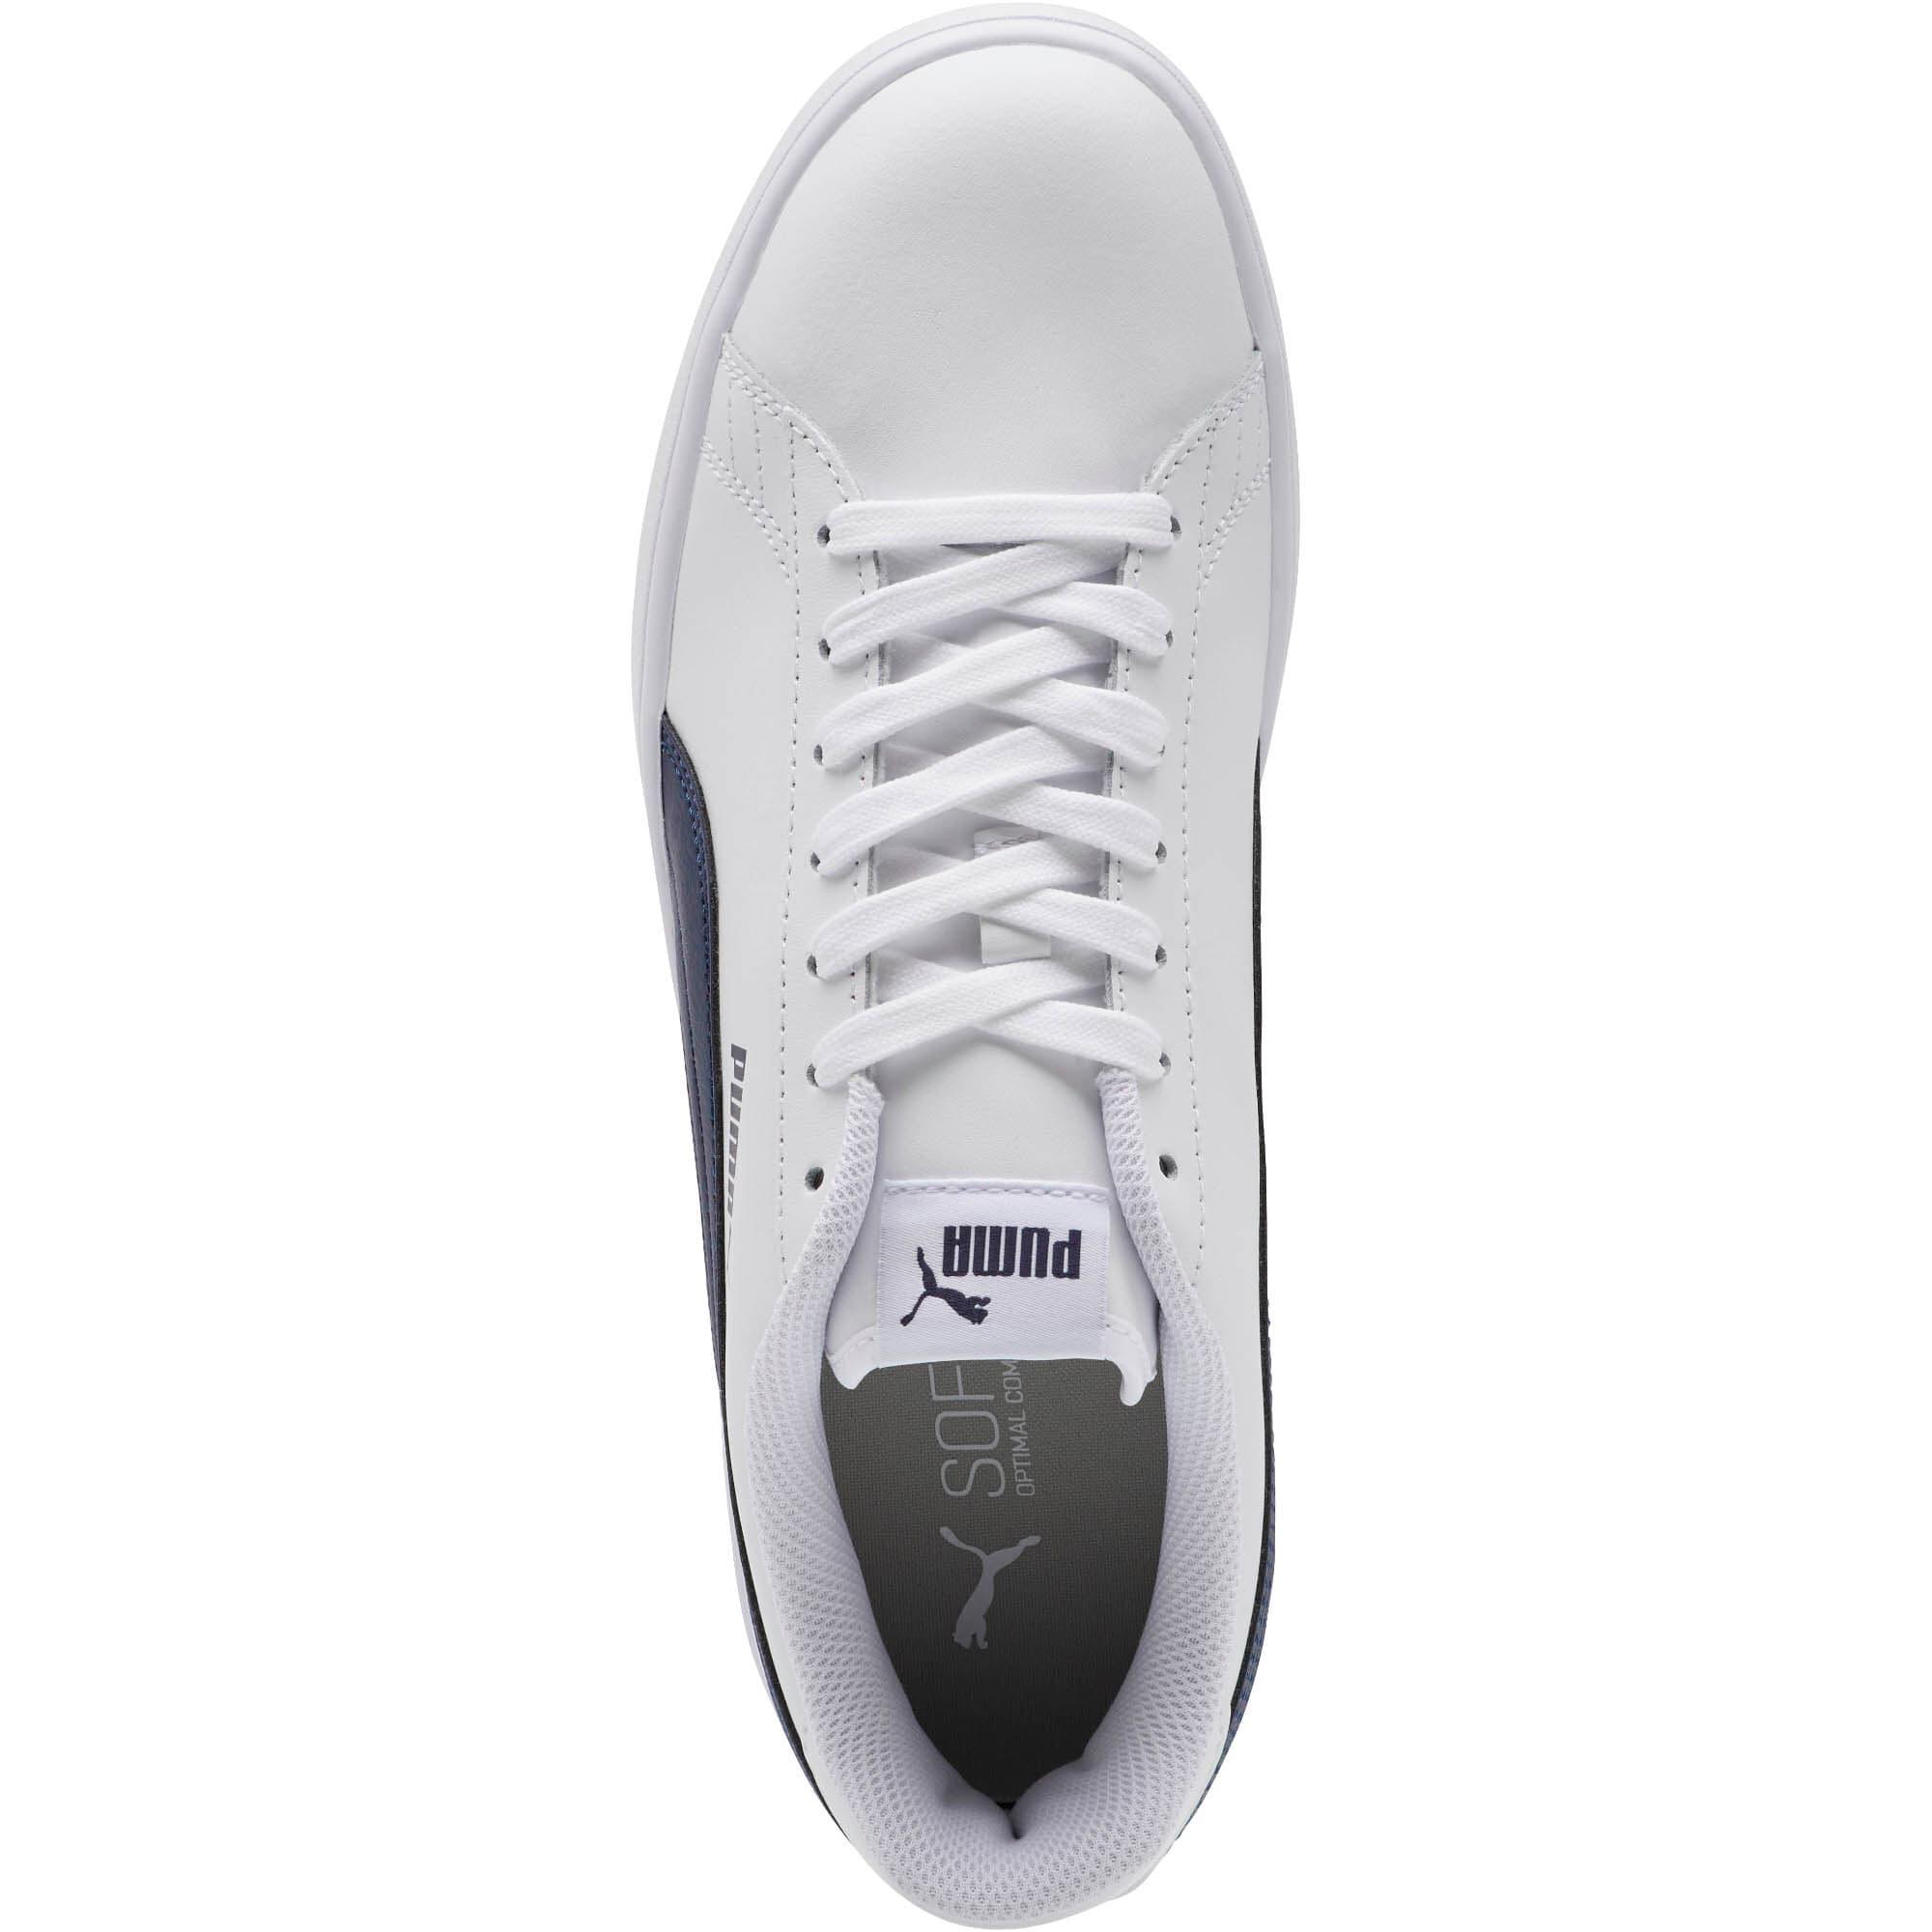 Thumbnail 5 of PUMA Smash v2 Sneakers, Puma White-Peacoat, medium